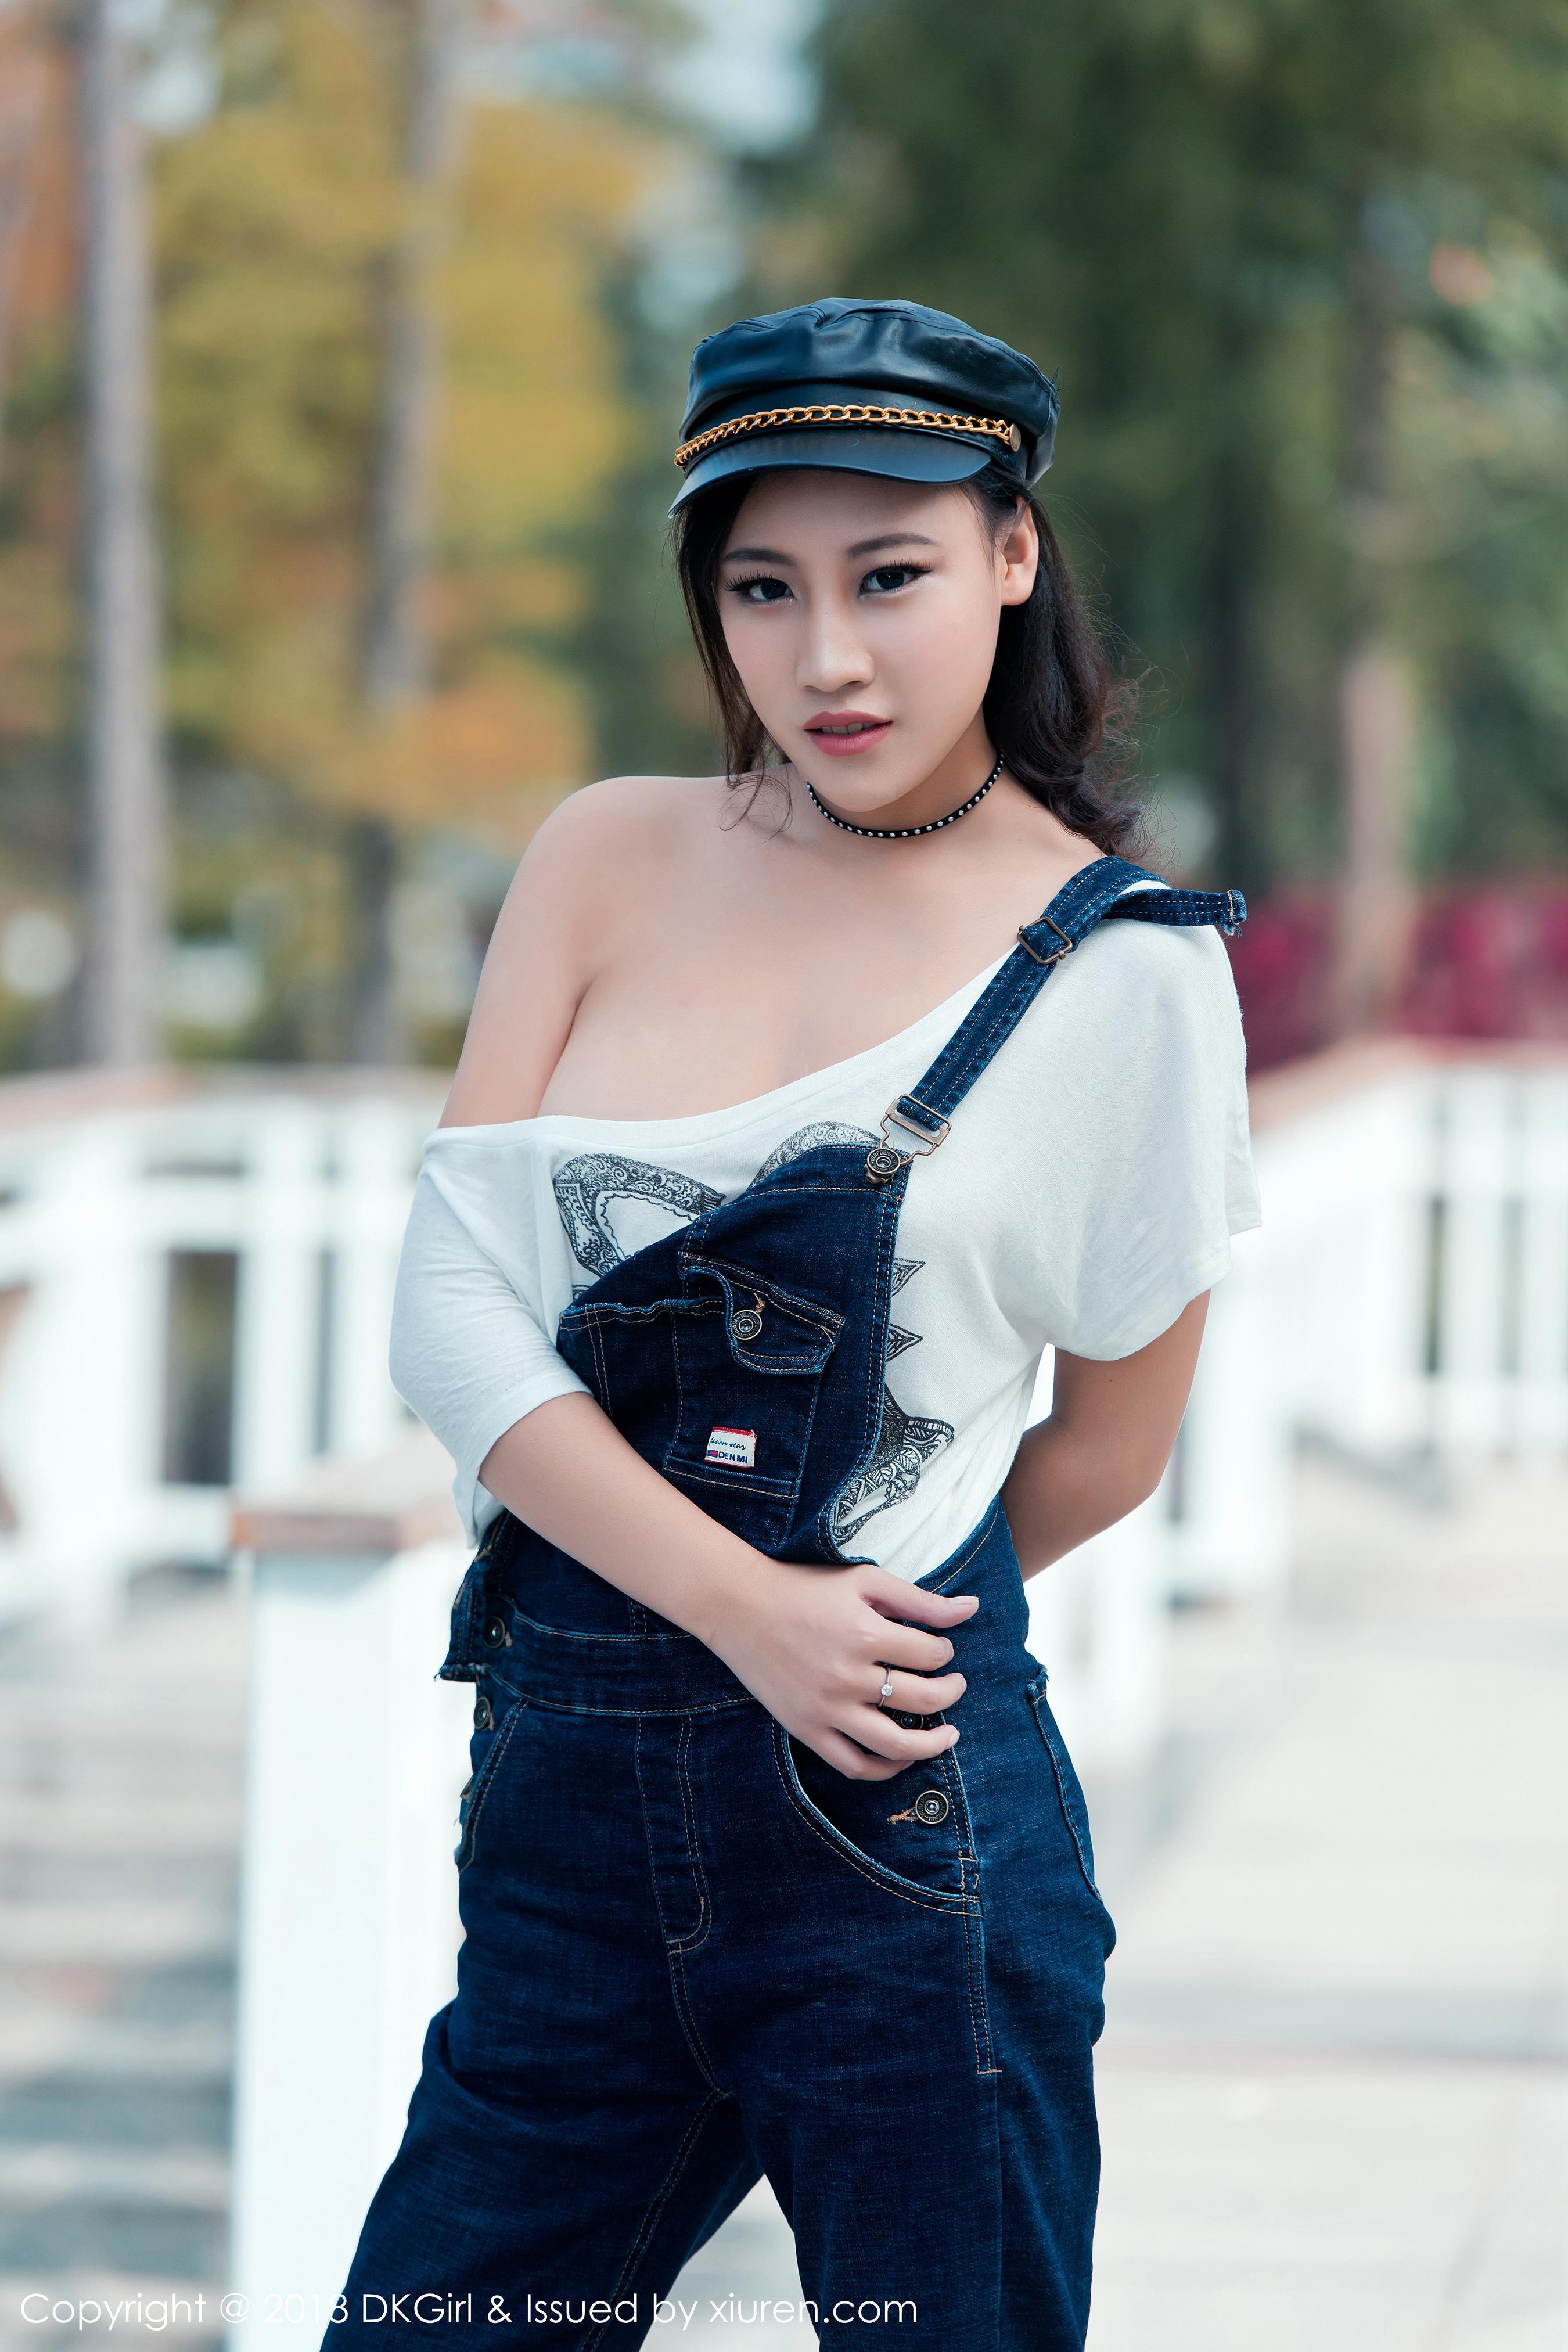 [DKGirl御女郎]DK20180205VOL0057 梦倩 牛仔吊带连身裤加黑色丝袜美腿郊外狂野写真集